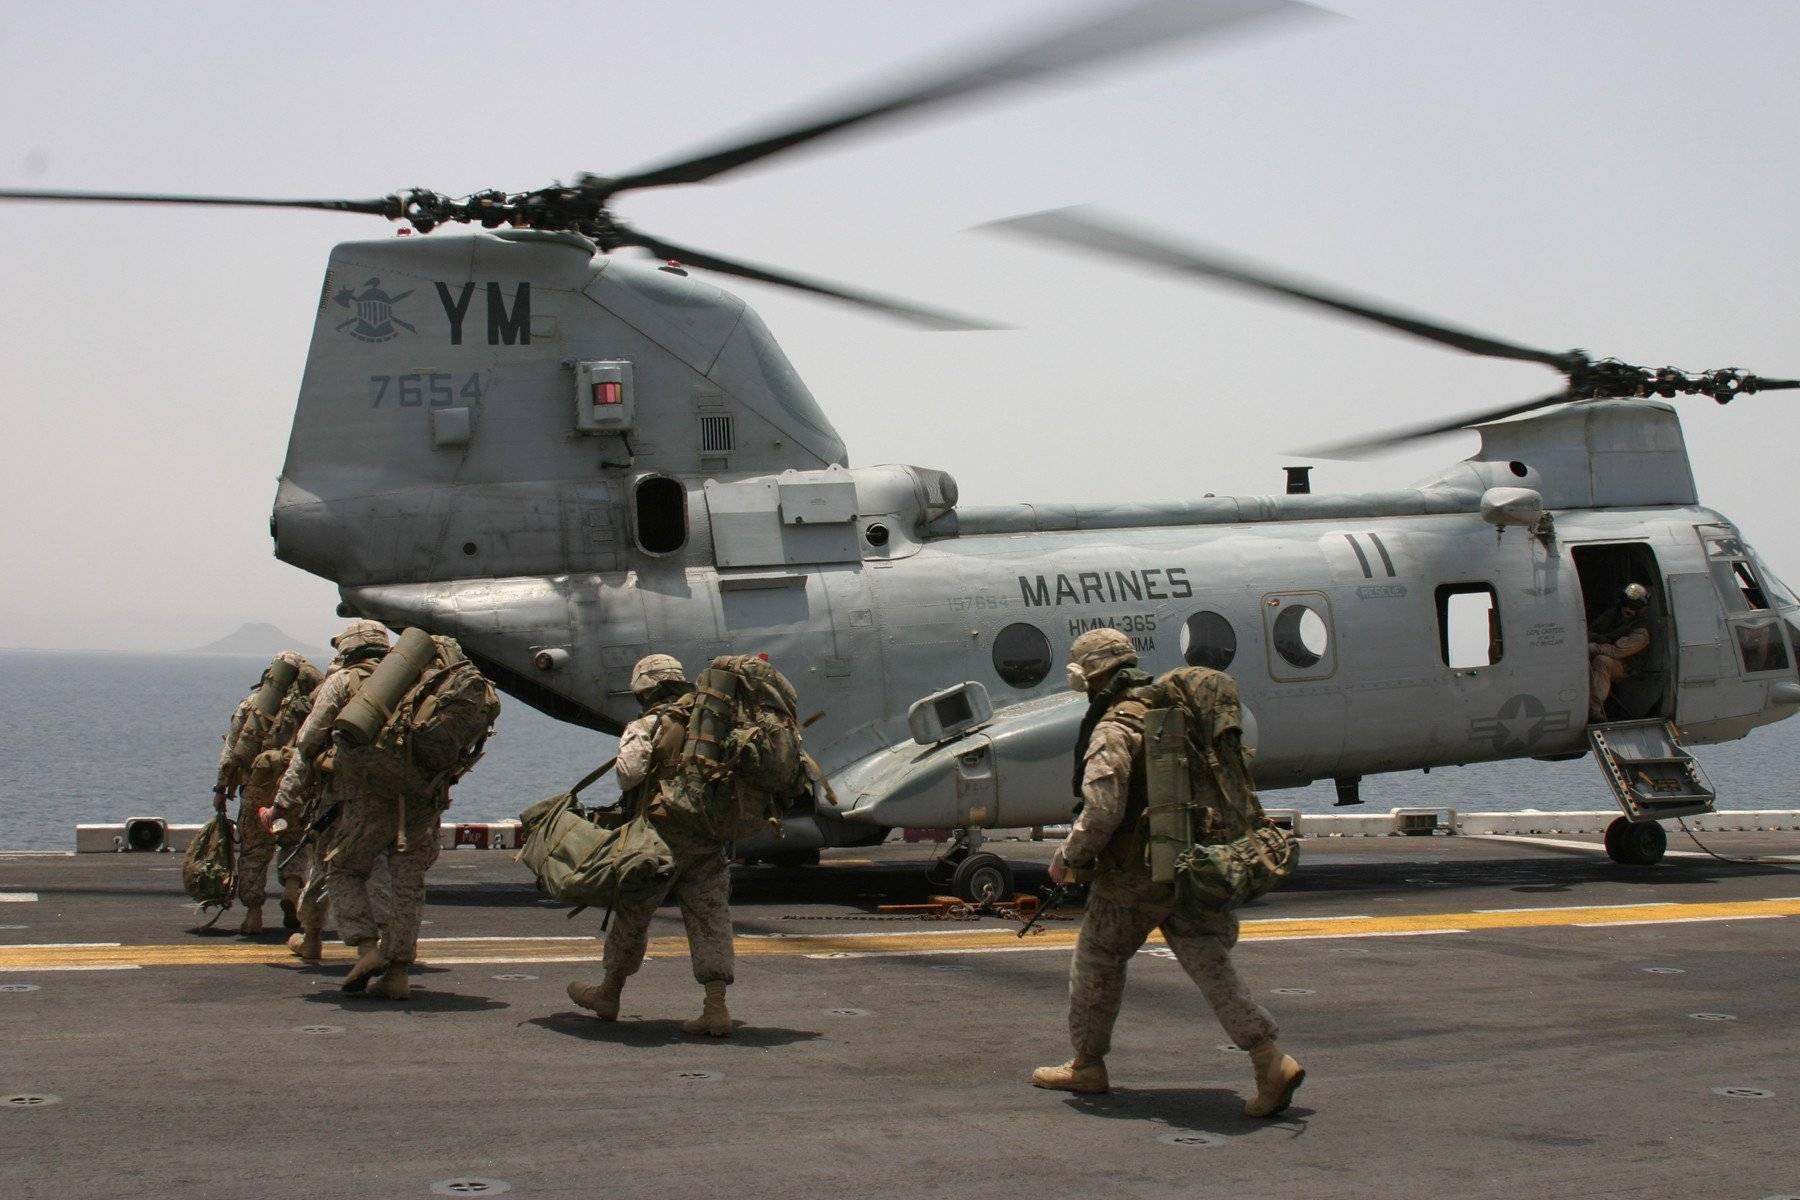 BOEING VERTOL CH-46 SEA KNIGHT